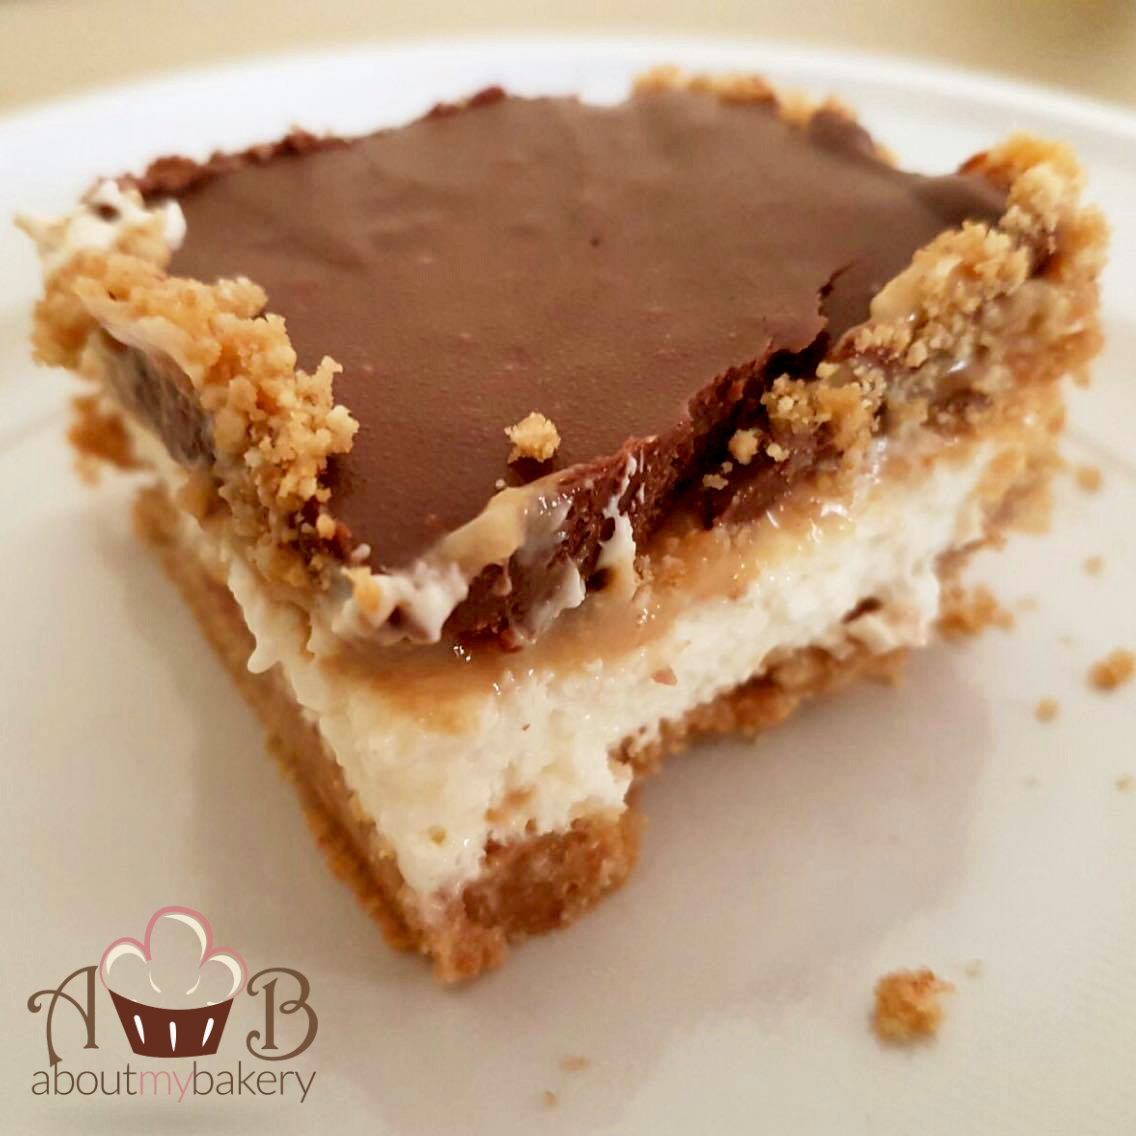 Torta twix cheesecake – Ricetta golosa